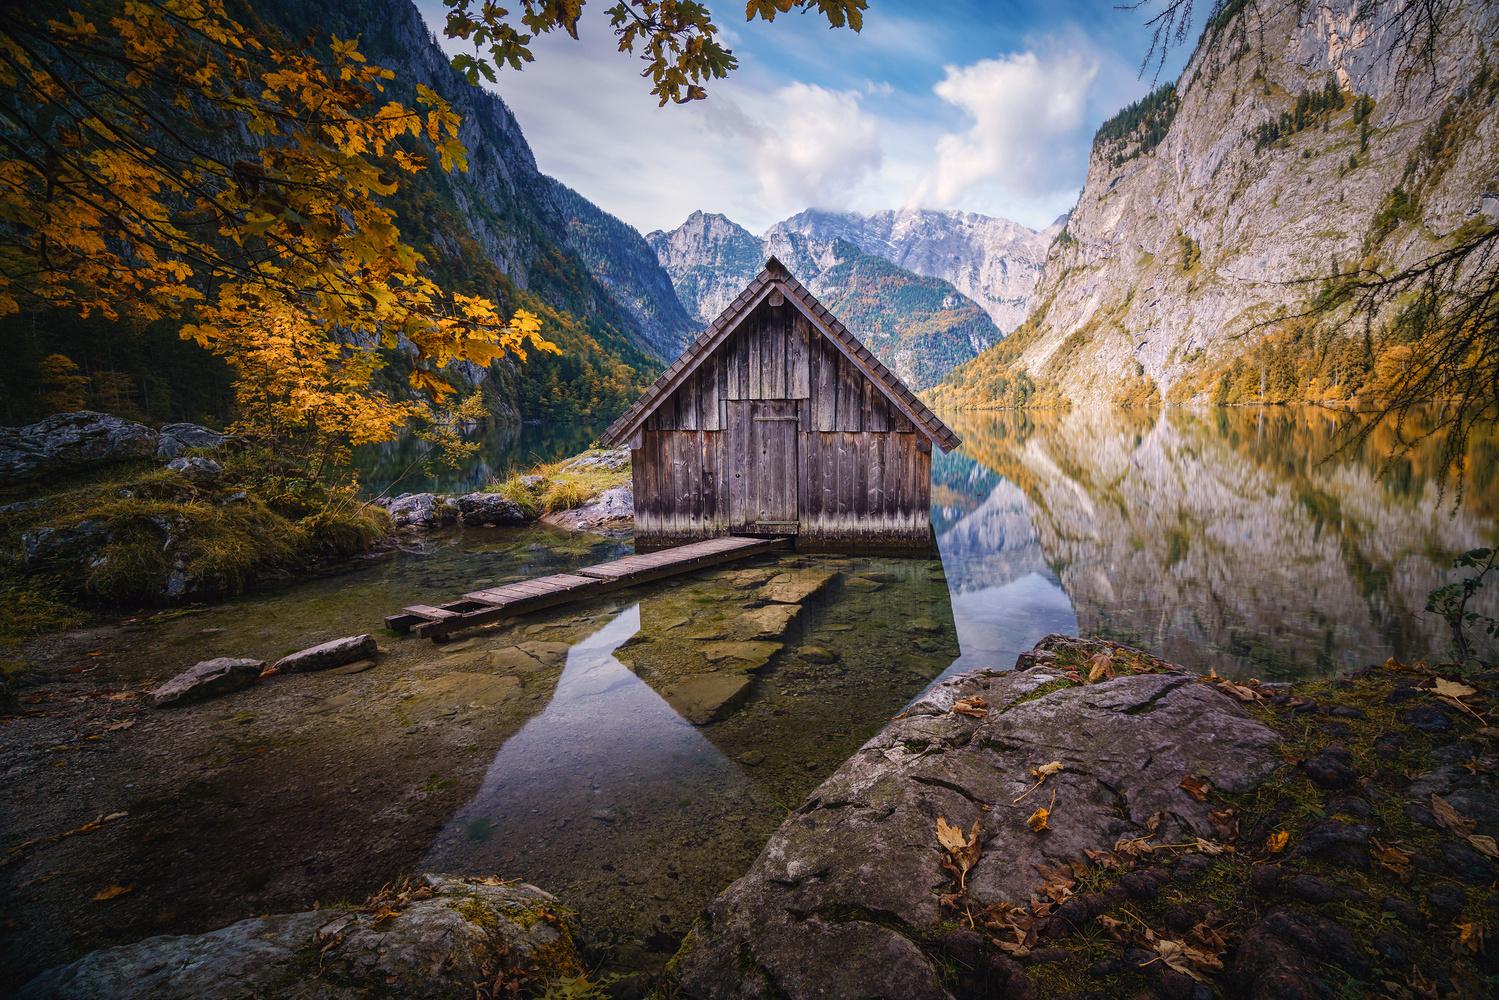 Obersee hut by Kai Hornung